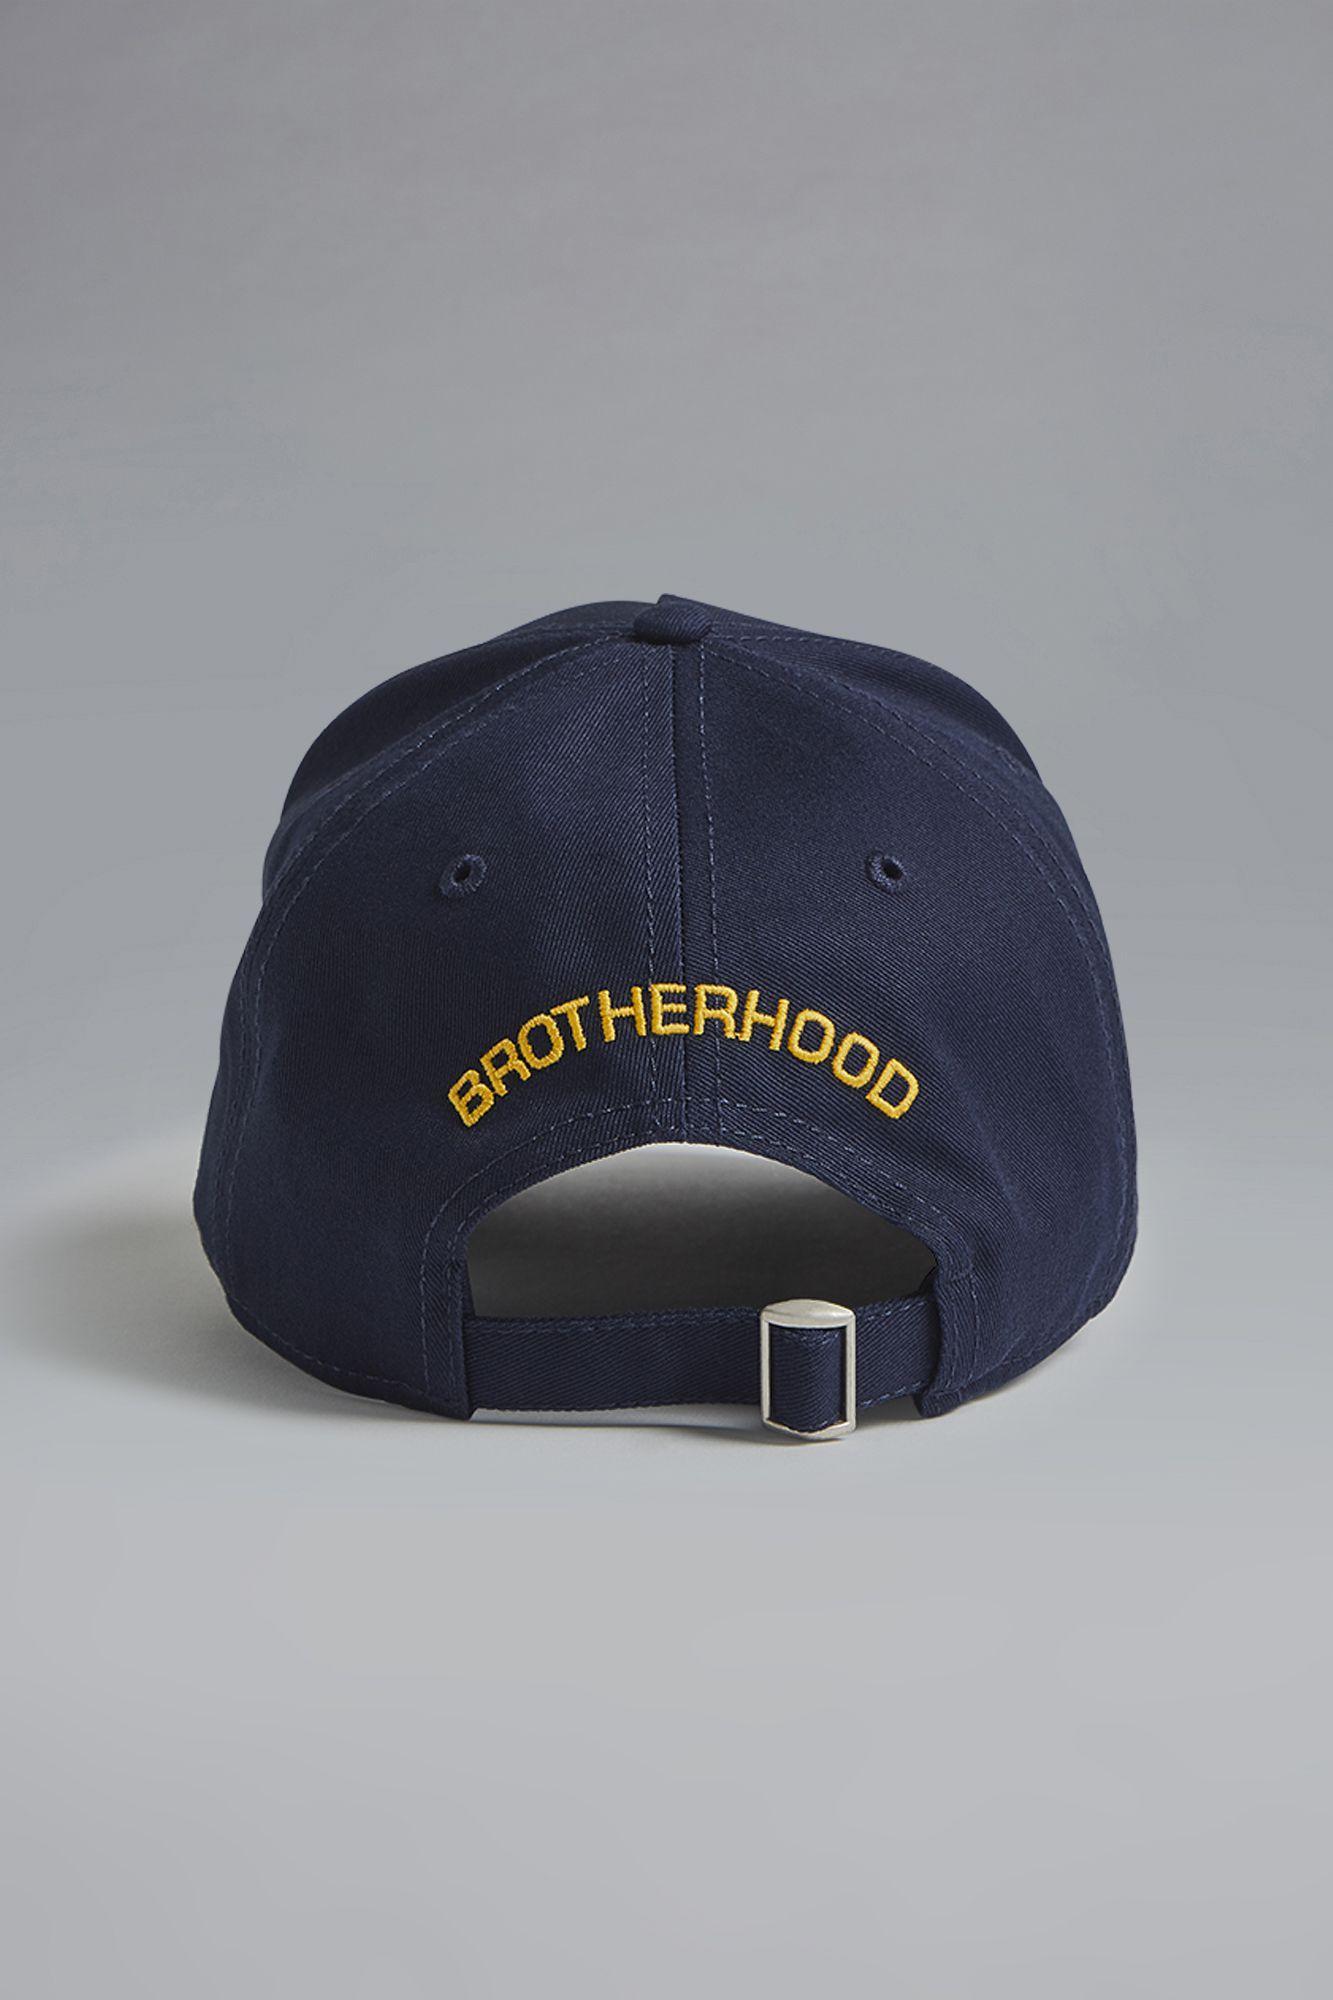 b7ccd3ef820641 DSquared² Caten Baseball Cap in Blue for Men - Lyst